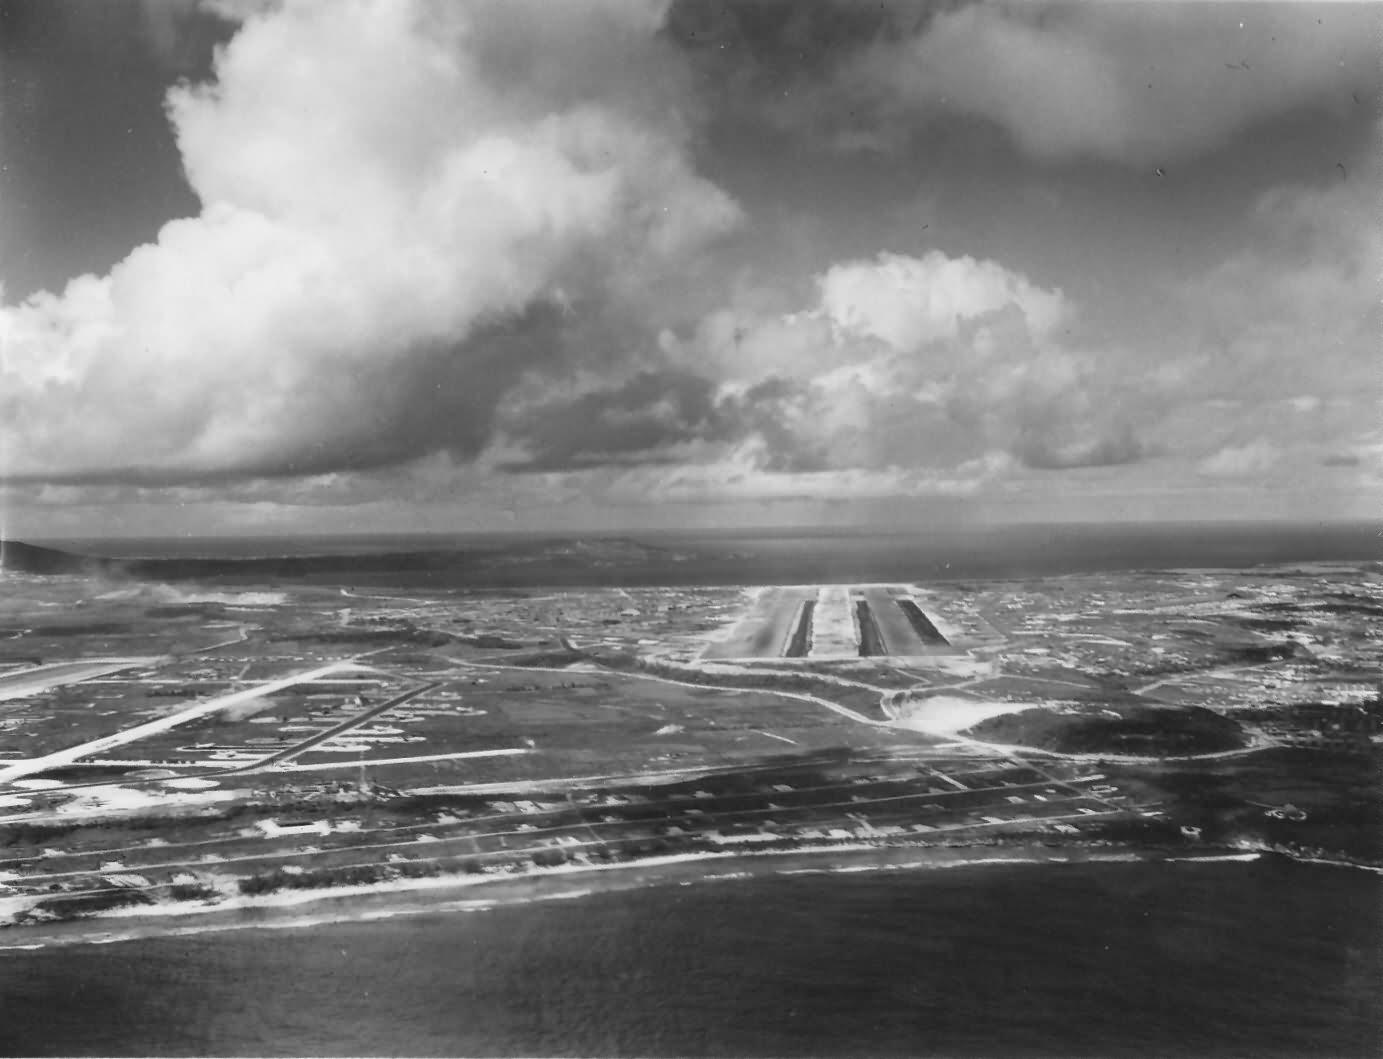 B-29 Superfortress bombers base Isley airfield on SAIPAN